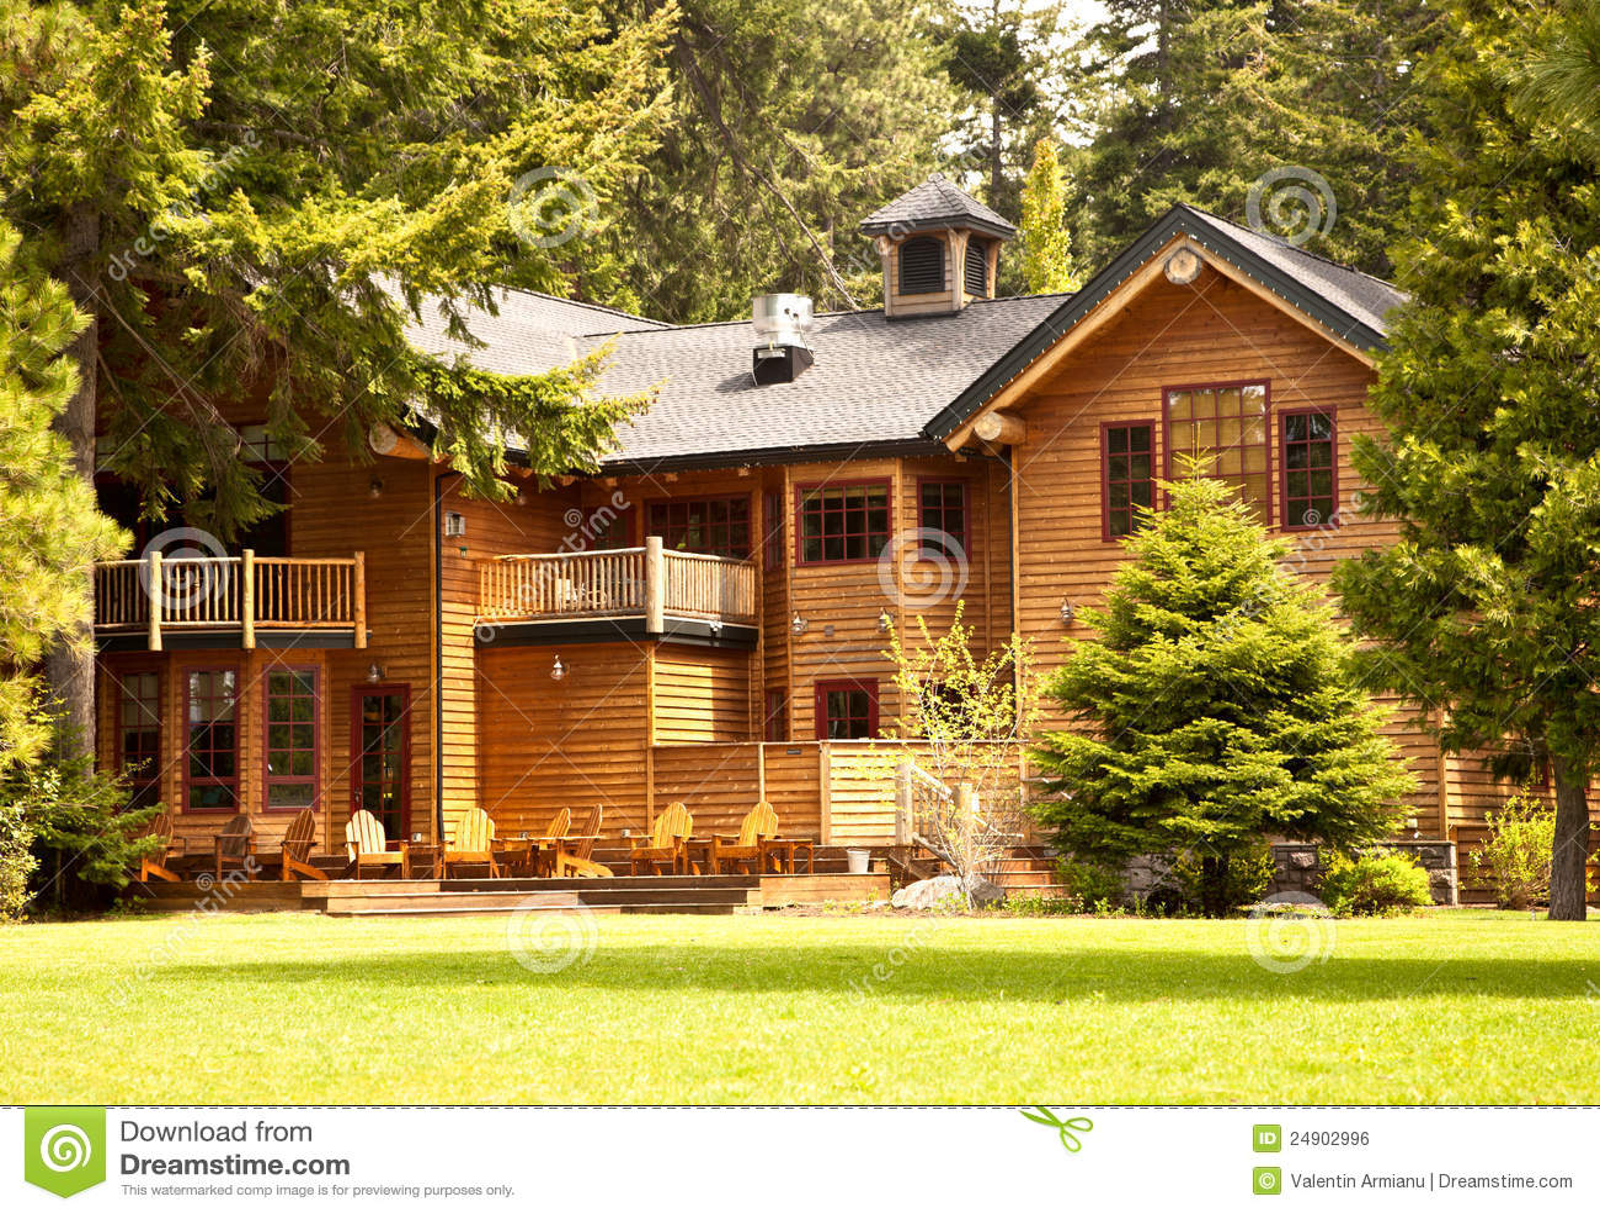 Log cabin on a lake royalty free stock photography image 7866317 - Royalty Free Stock Photo Cabin Log